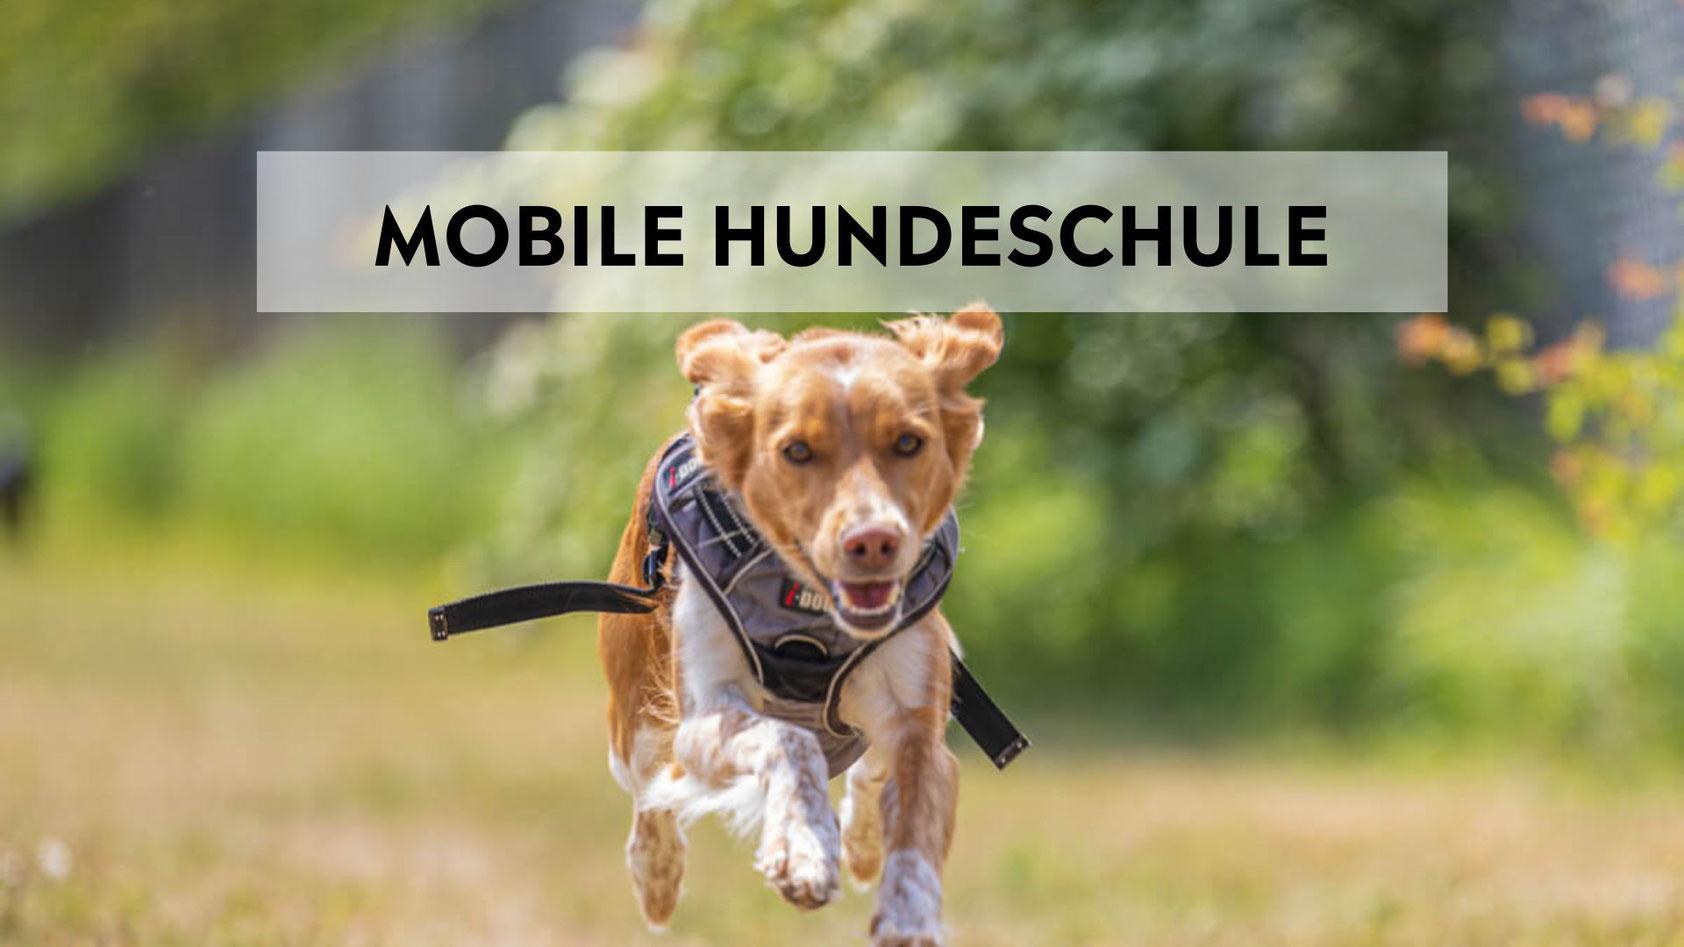 mobile Hundeschule, hundetraining